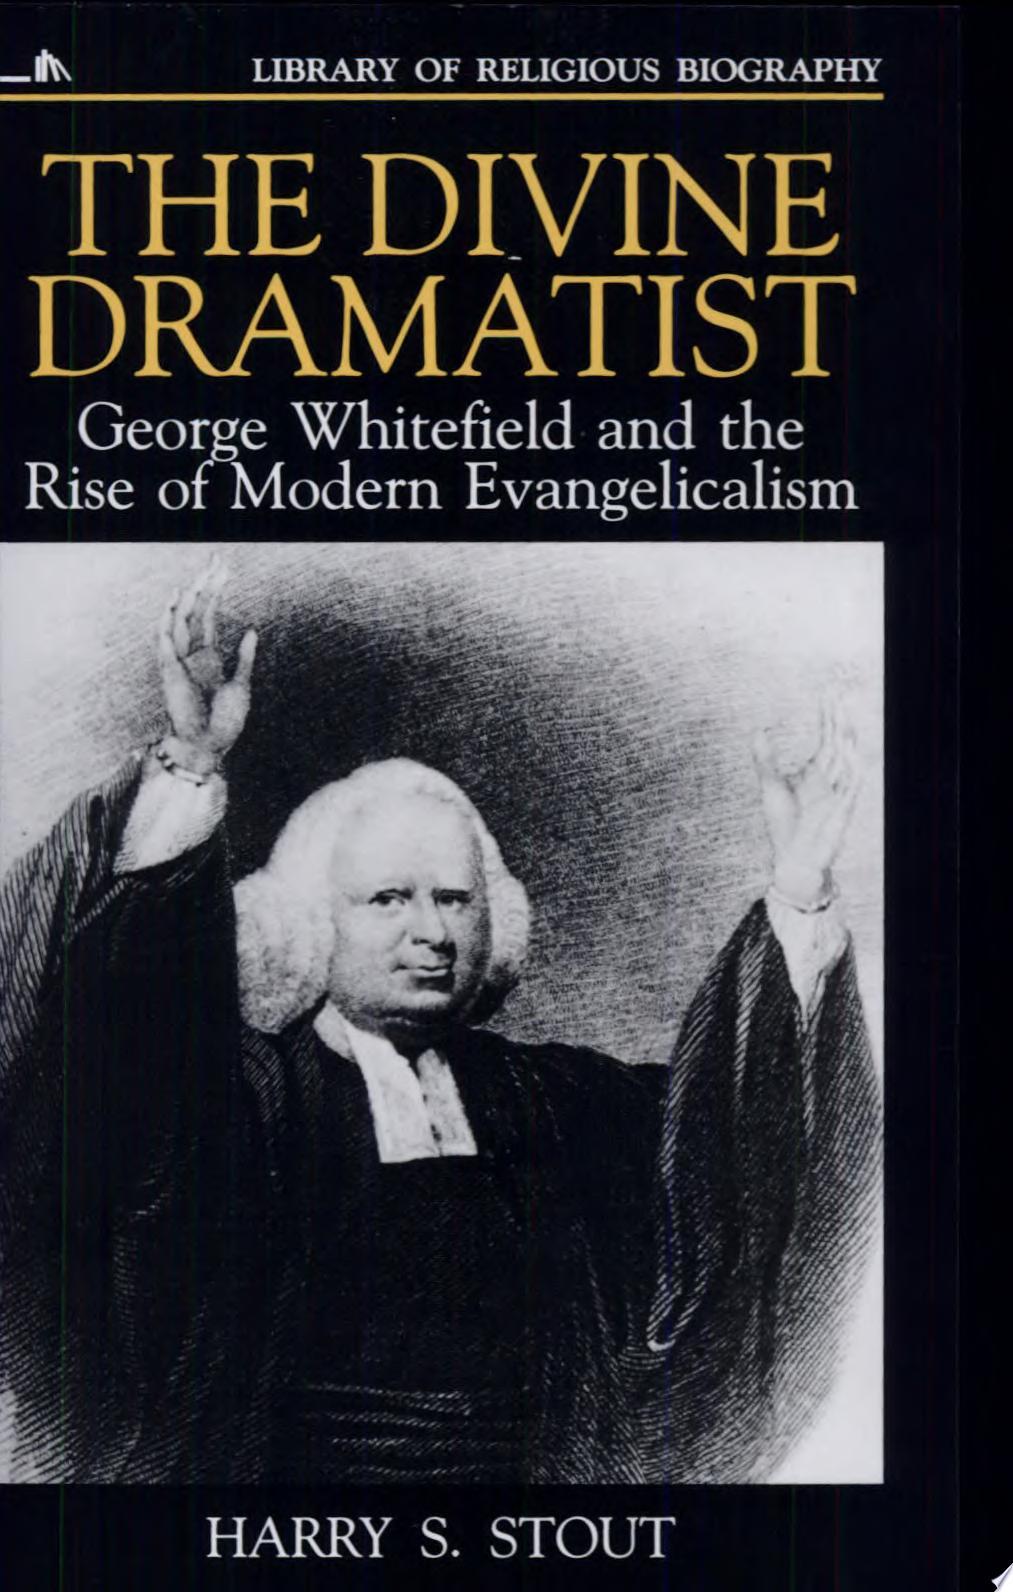 The Divine Dramatist